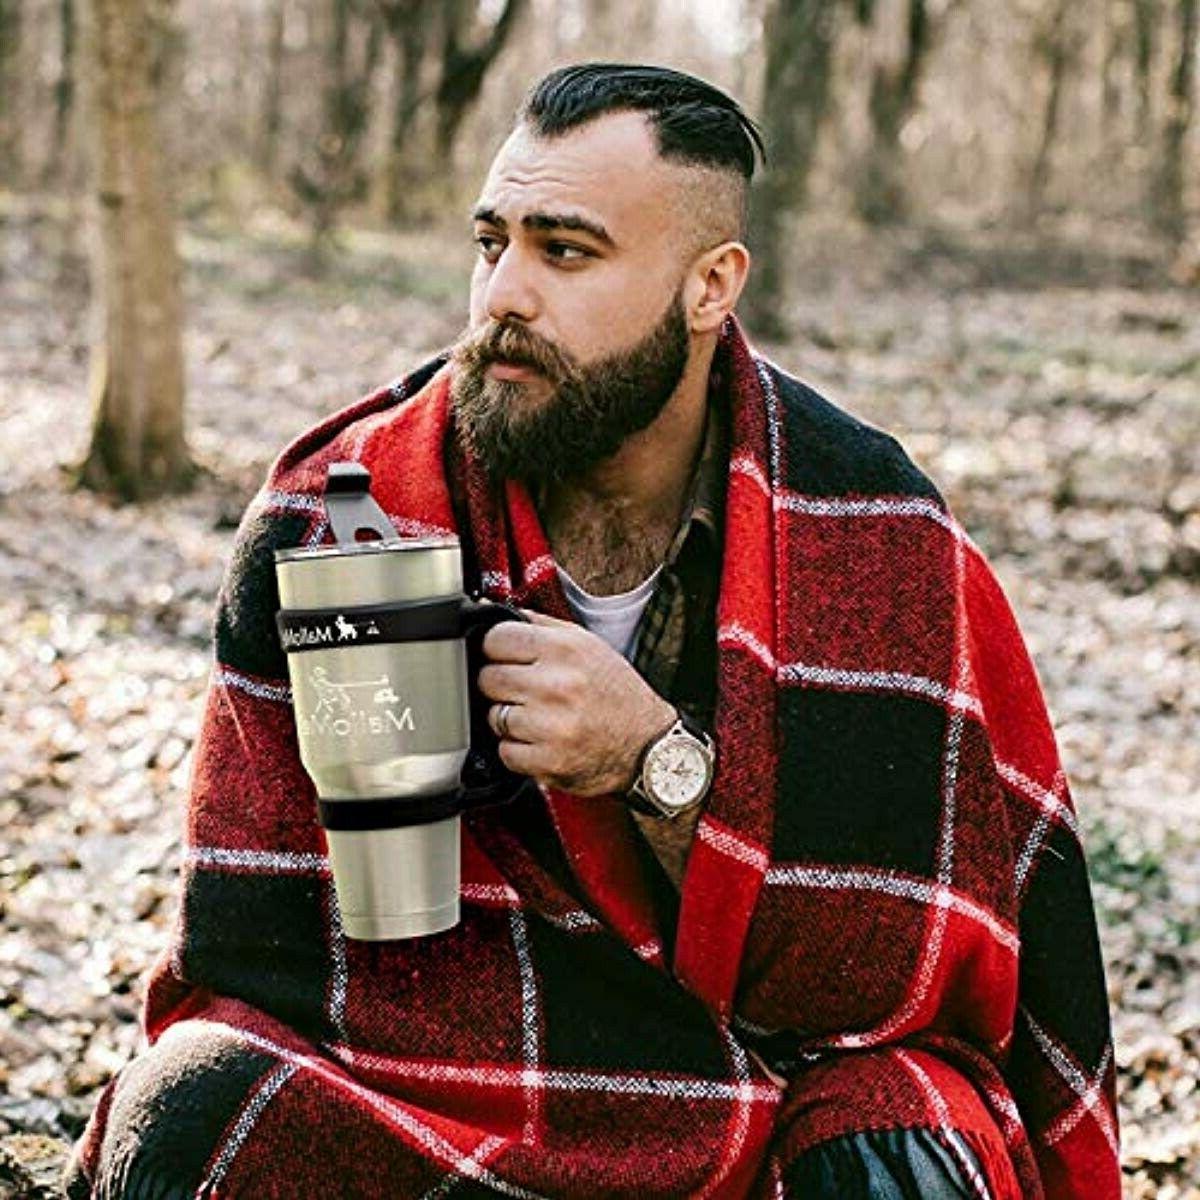 MalloMe 30 Cup Travel Mug 2 Lid